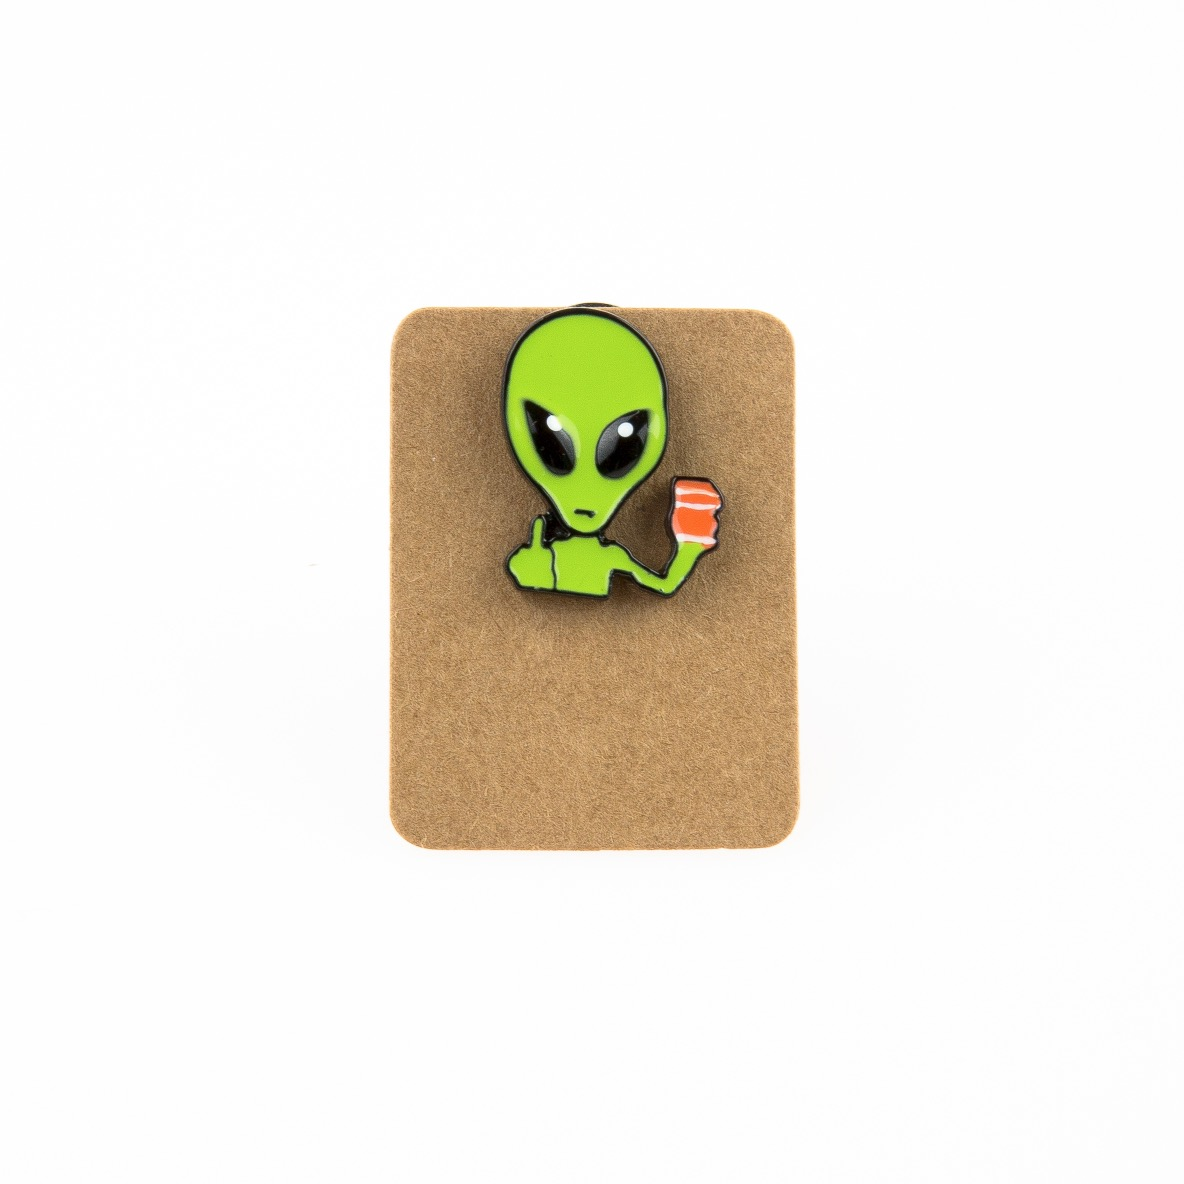 Metal Alien Middle Finger Enamel Pin Badge